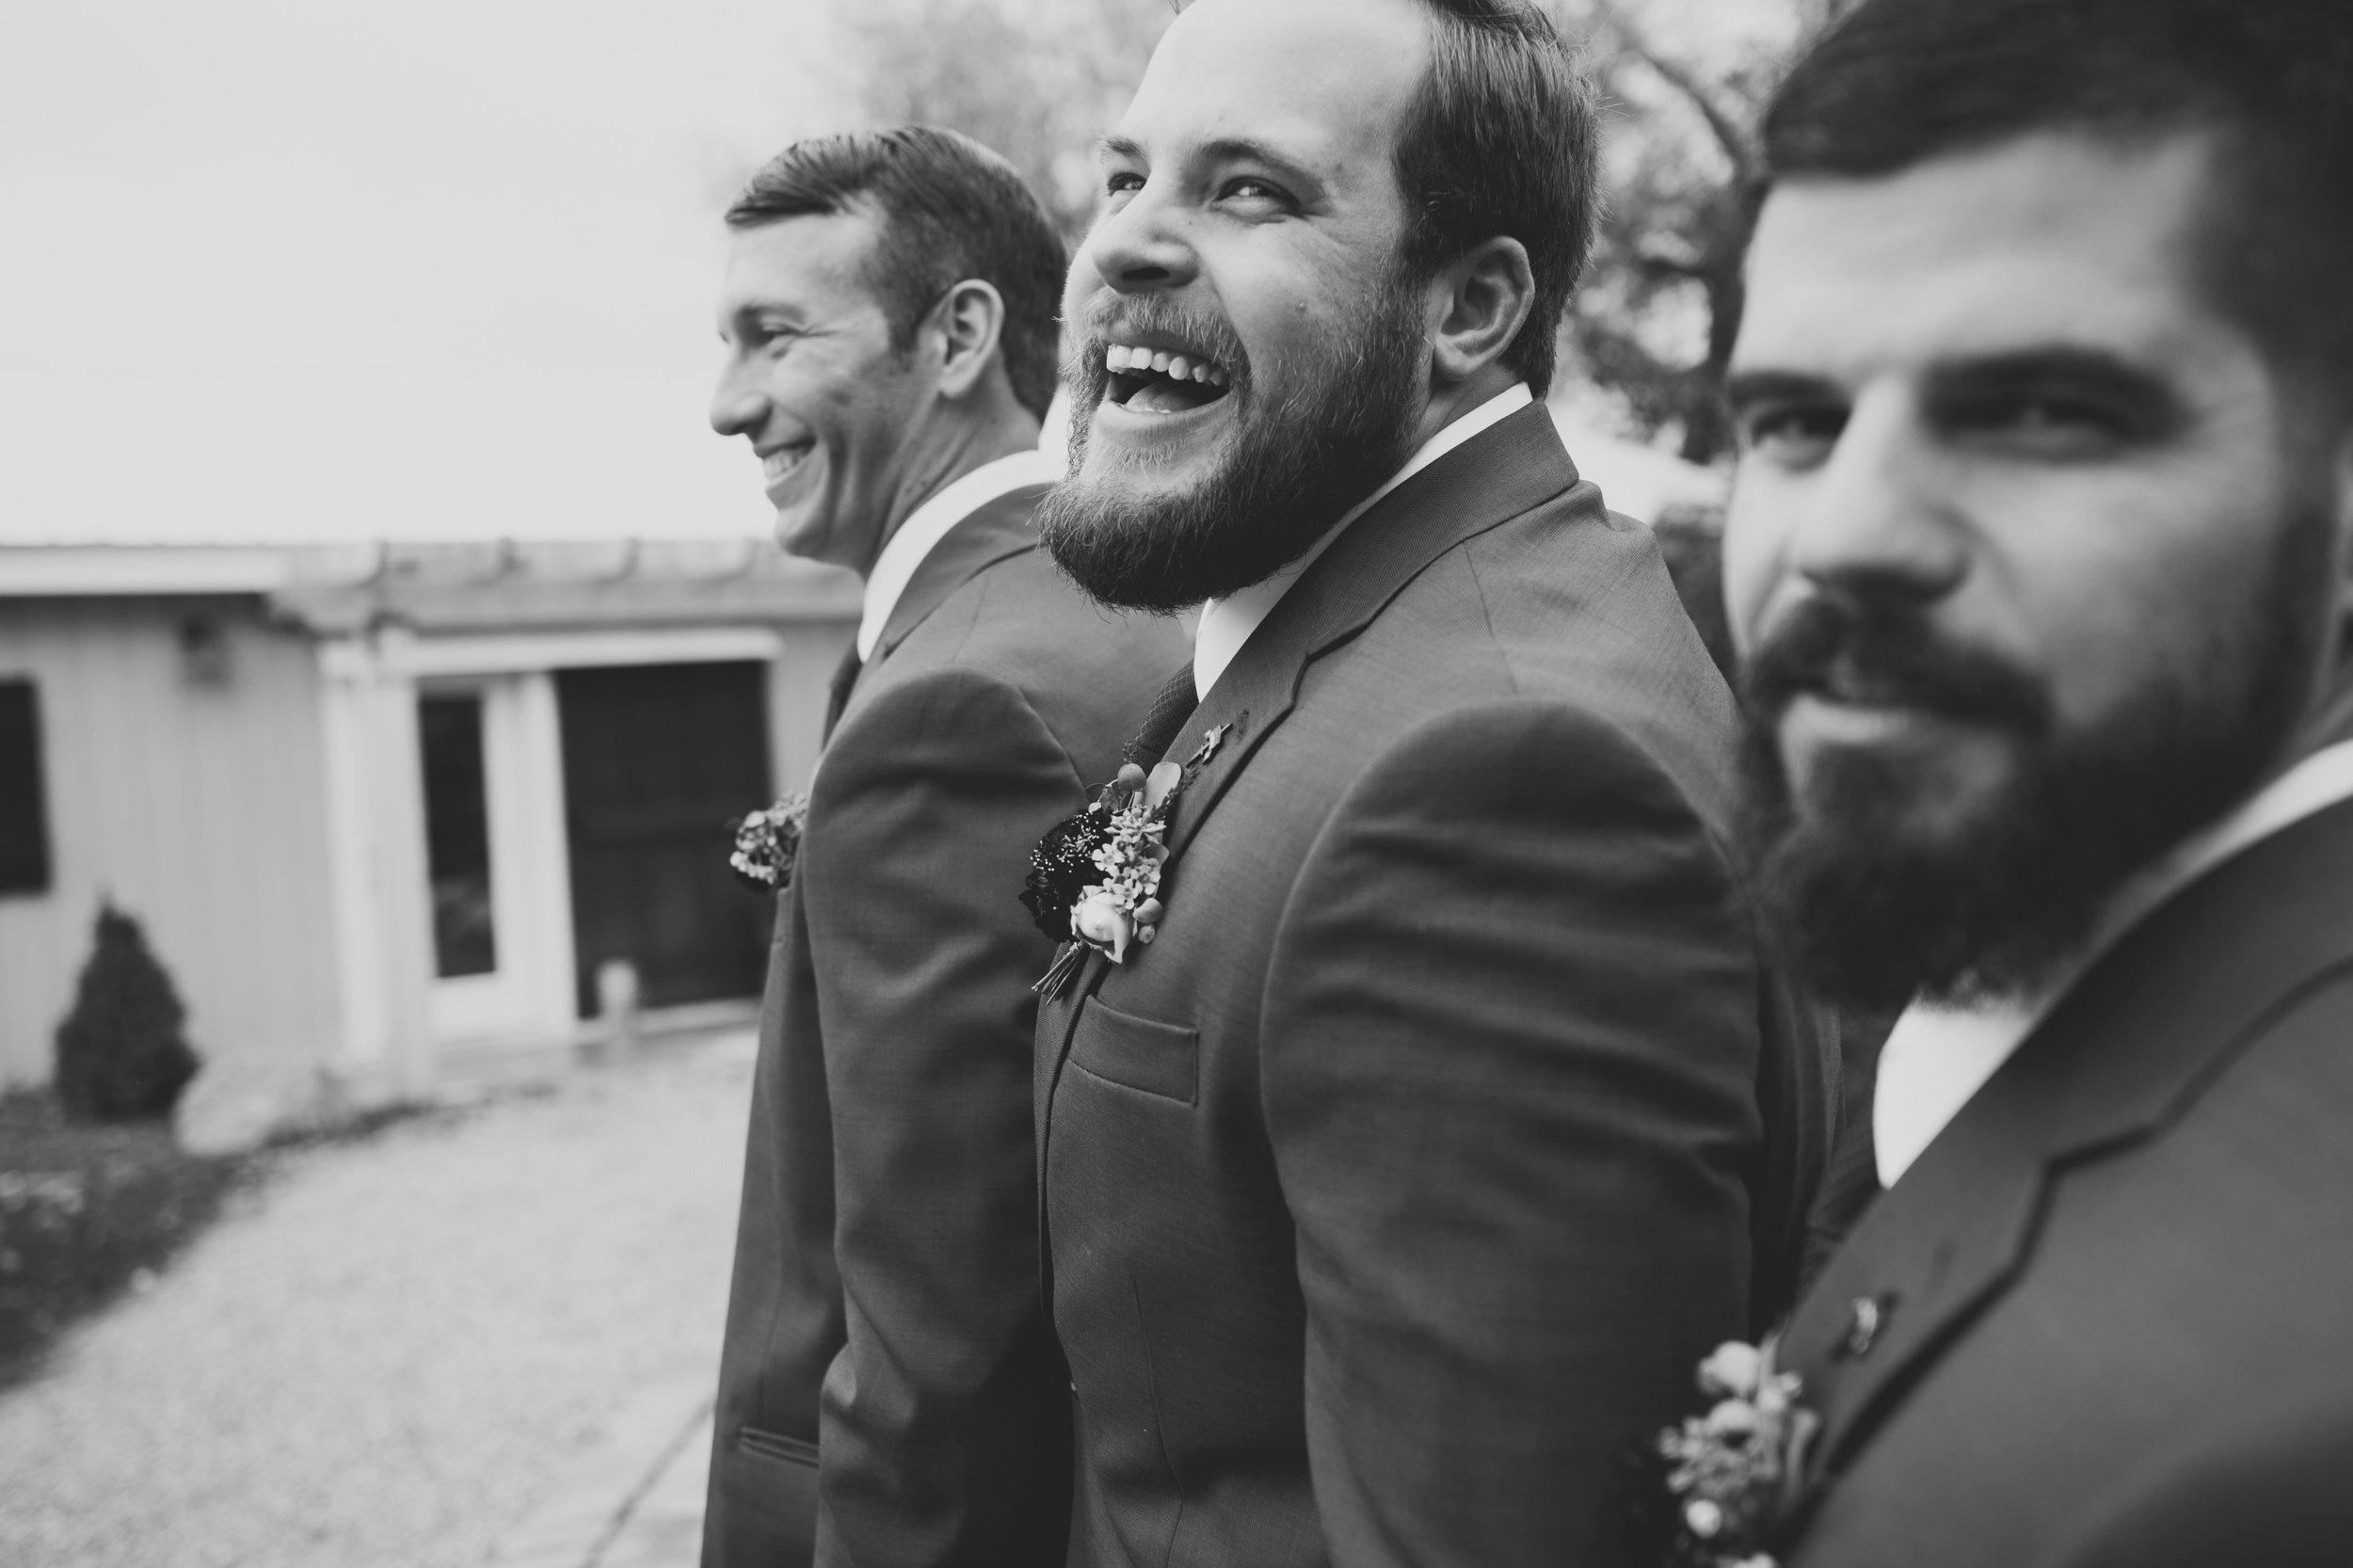 wildwoodfamilyfarms-wildwood farms-grand rapids-grand rapids wedding -grand rapids wedding photographer-wedding-wildwood farms wedding-michigan wedding-west michigan photographer-jessica darling-j darling photo-becca and josh wedding 060.jpg